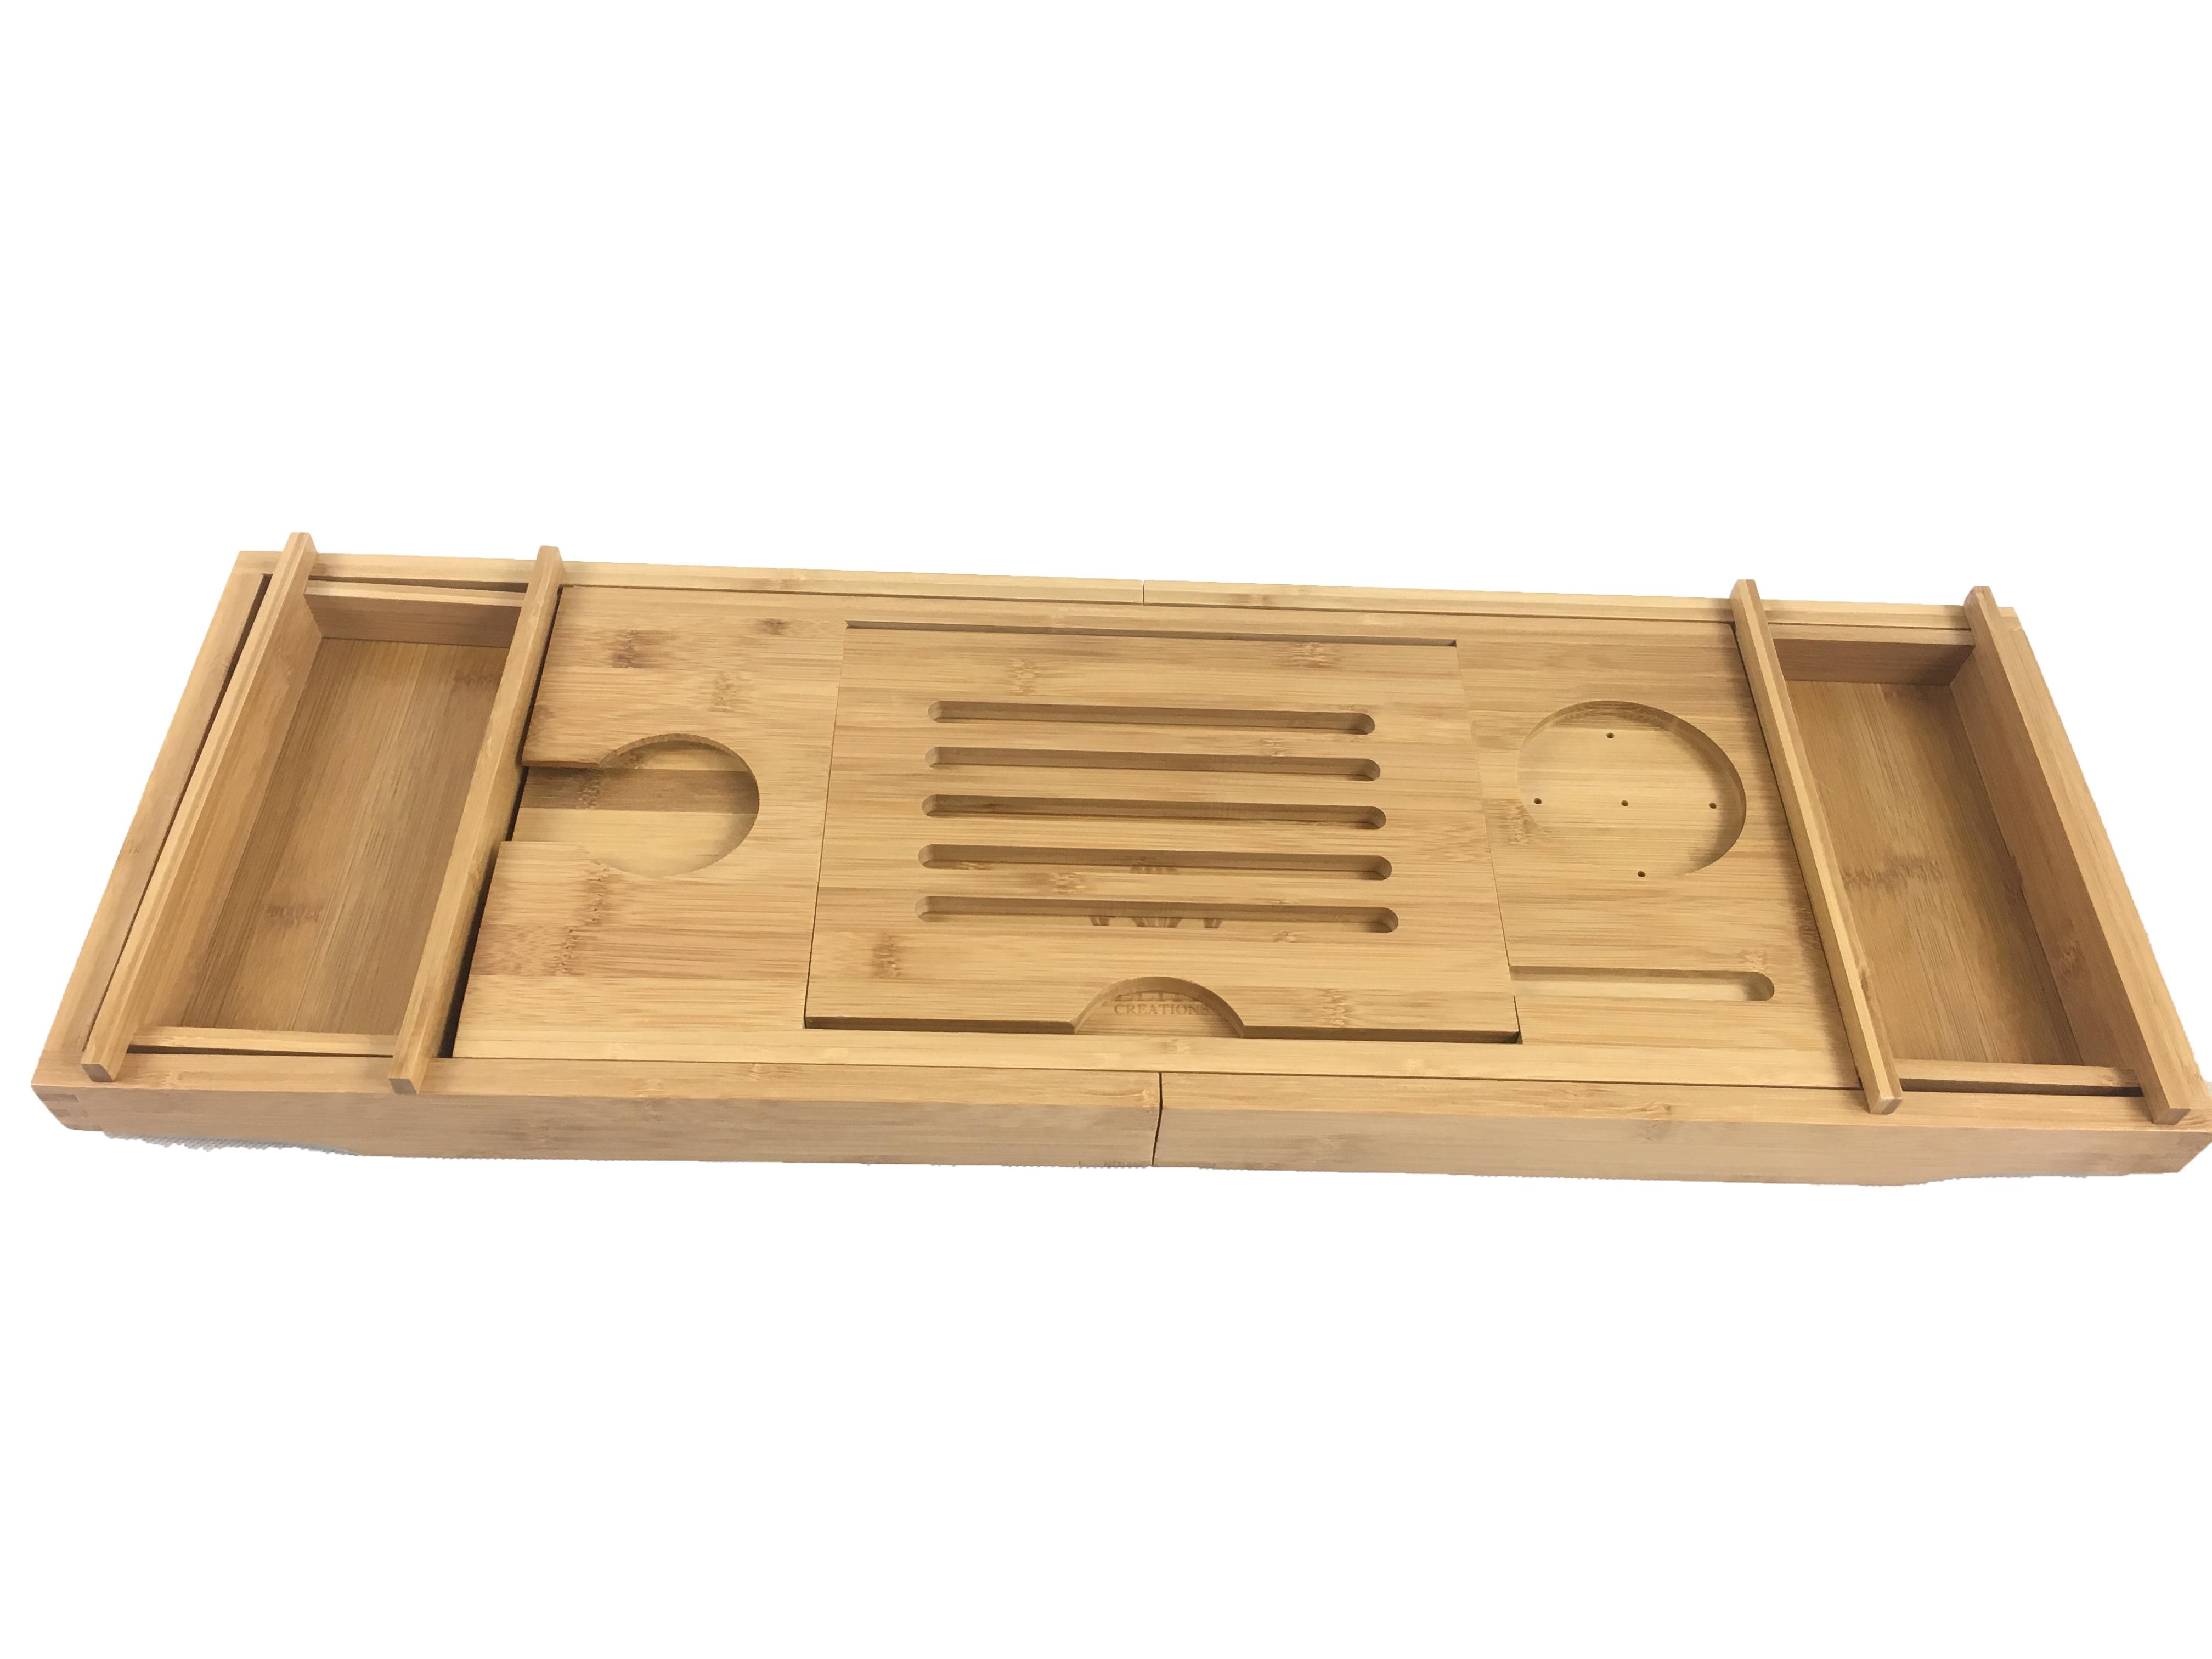 Bathtub Caddy & Laptop Bed Desk – 2 In 1 Innovative Design | HOMEX